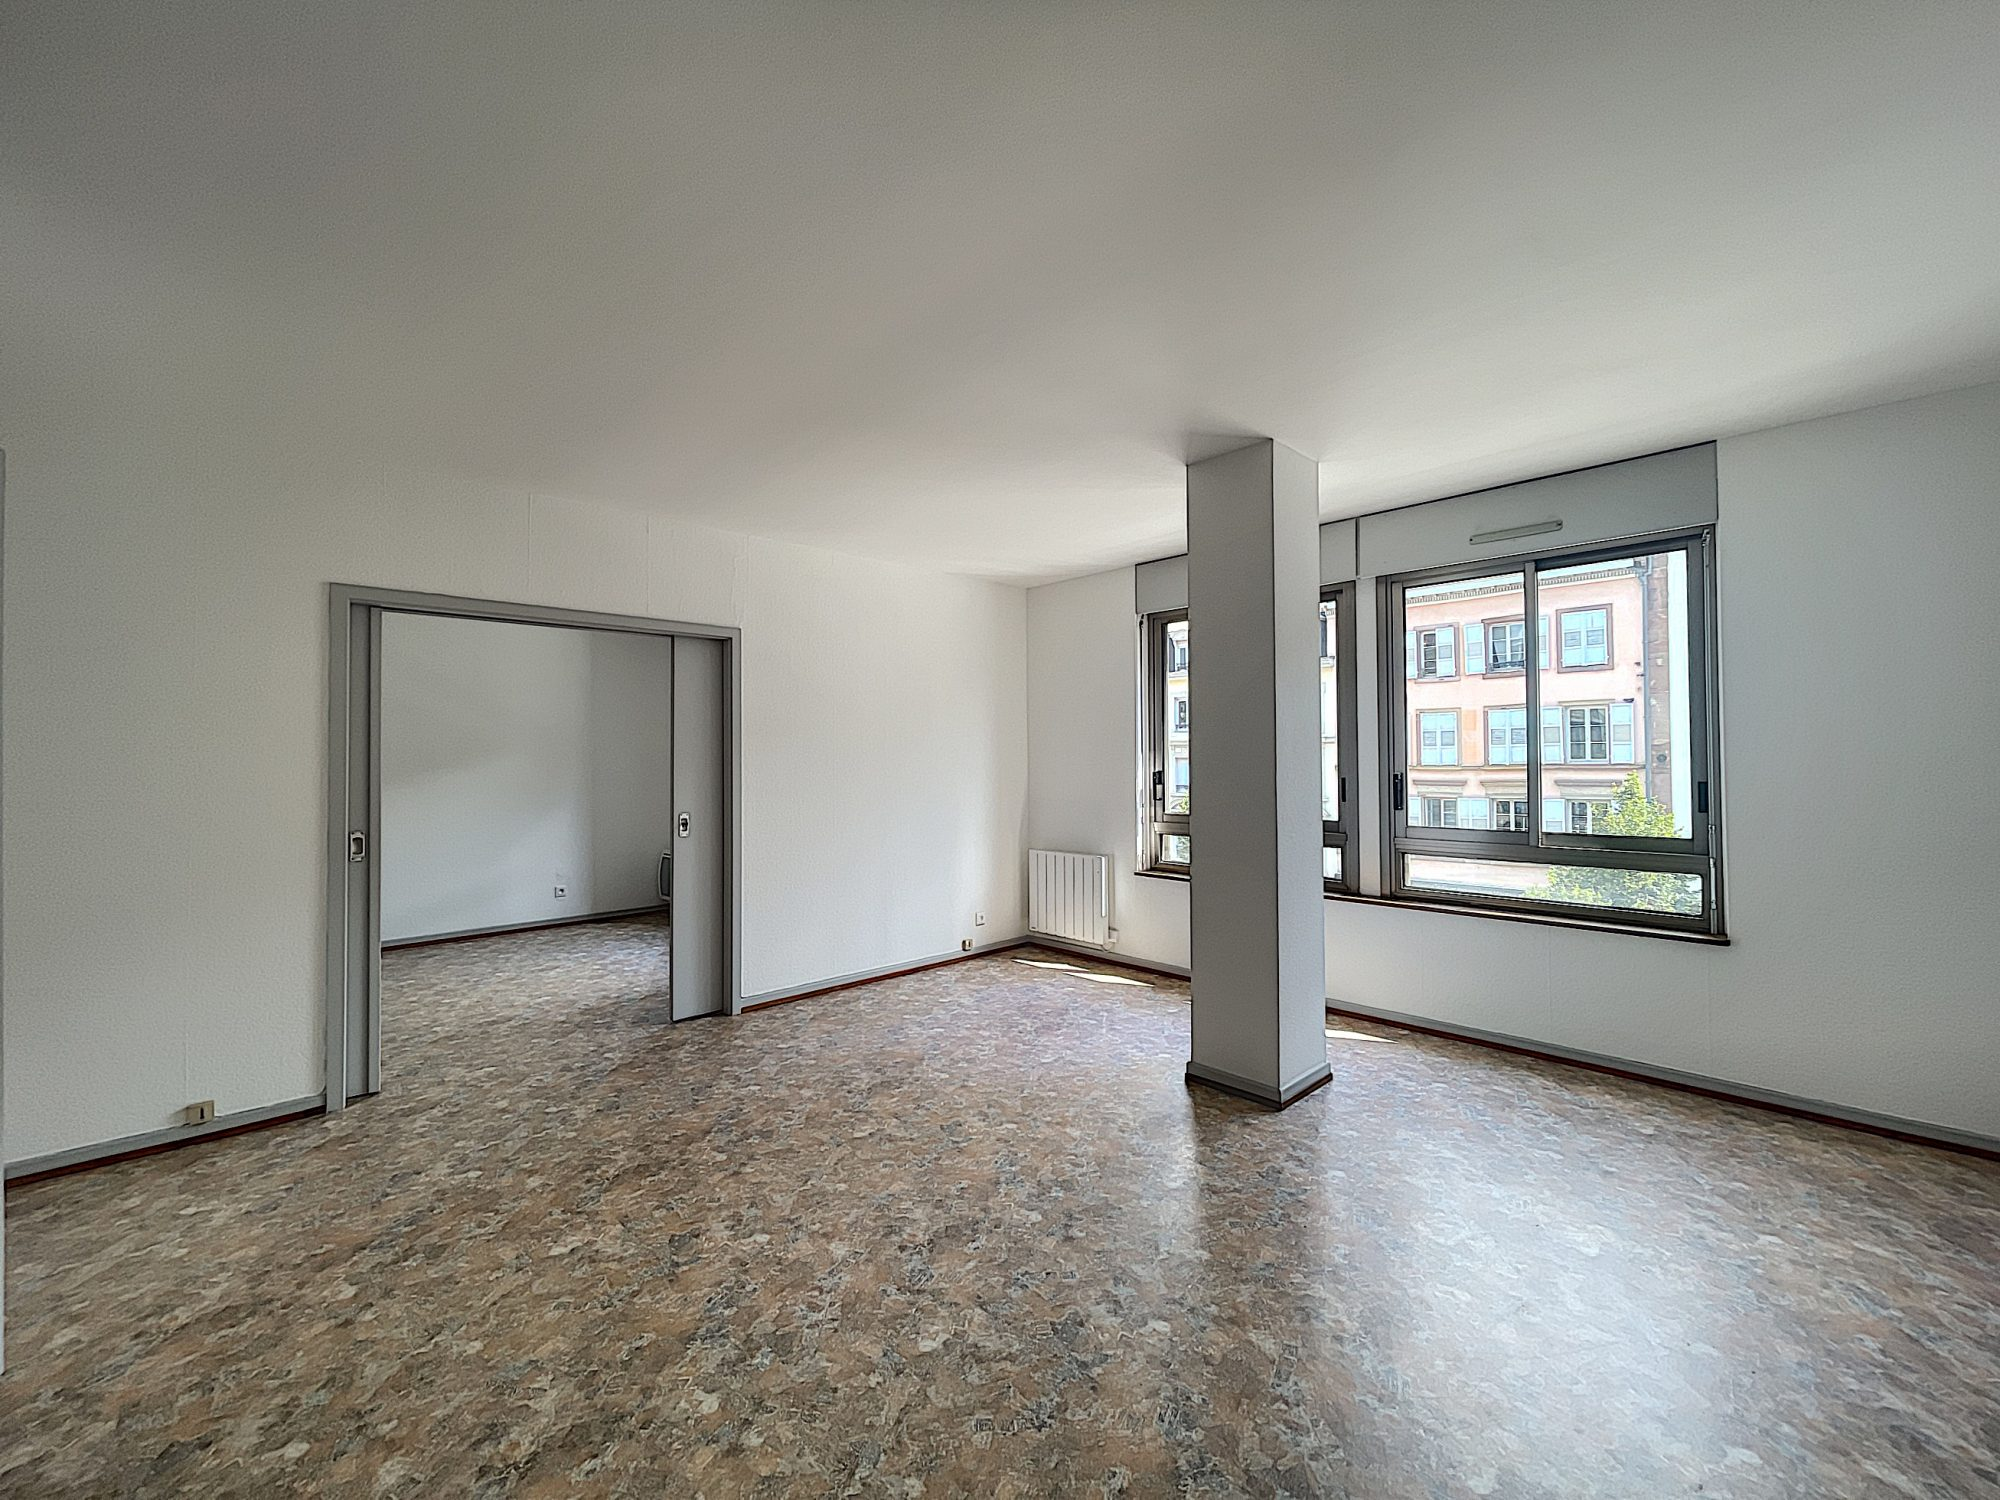 STRASBOURG Appartement 2 Pièces 57,03m2